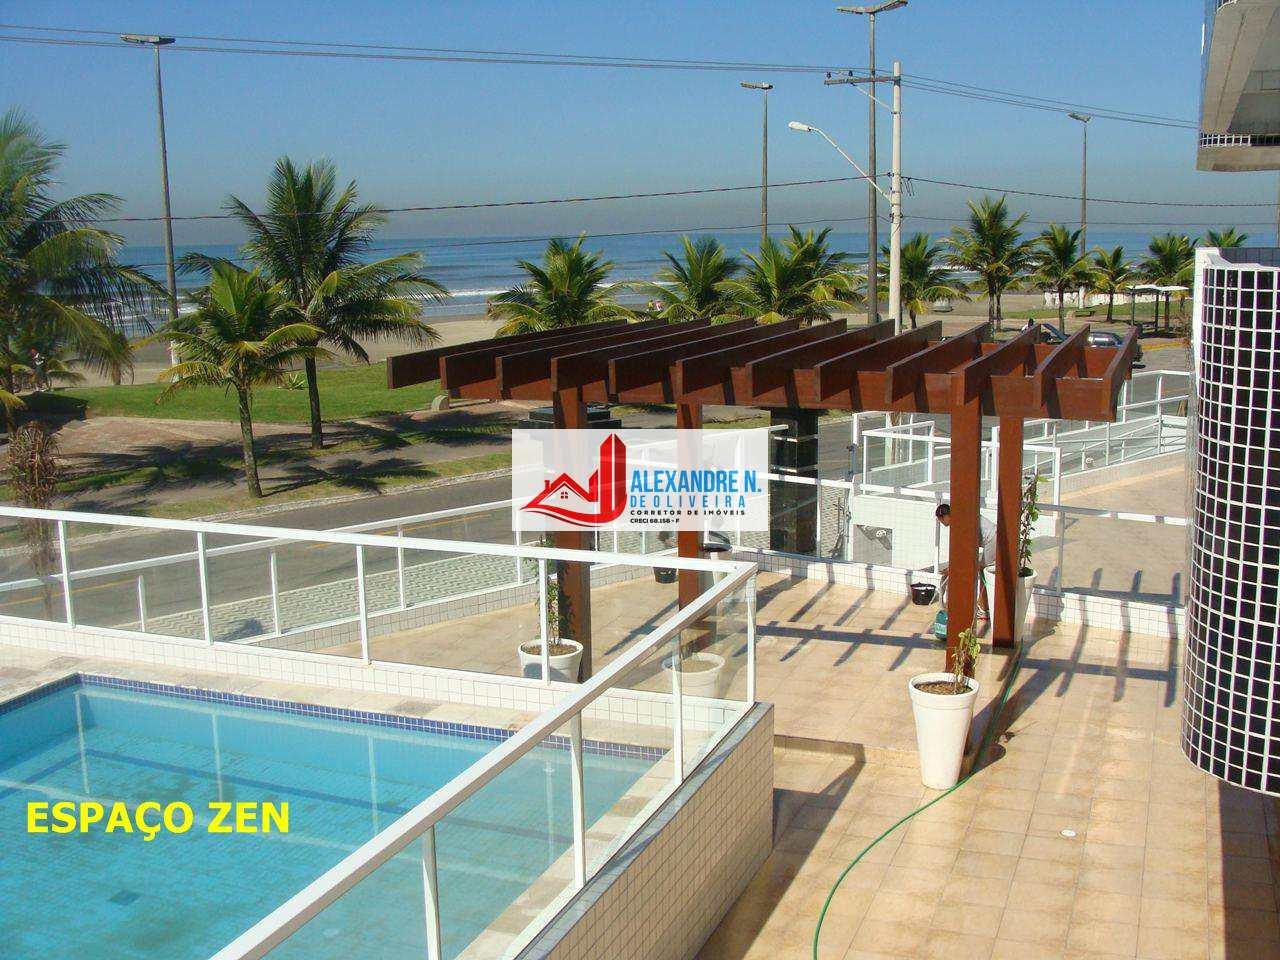 Apartamento com 2 dorms, Mirim, Praia Grande - R$ 330 mil, Cod: AP00546